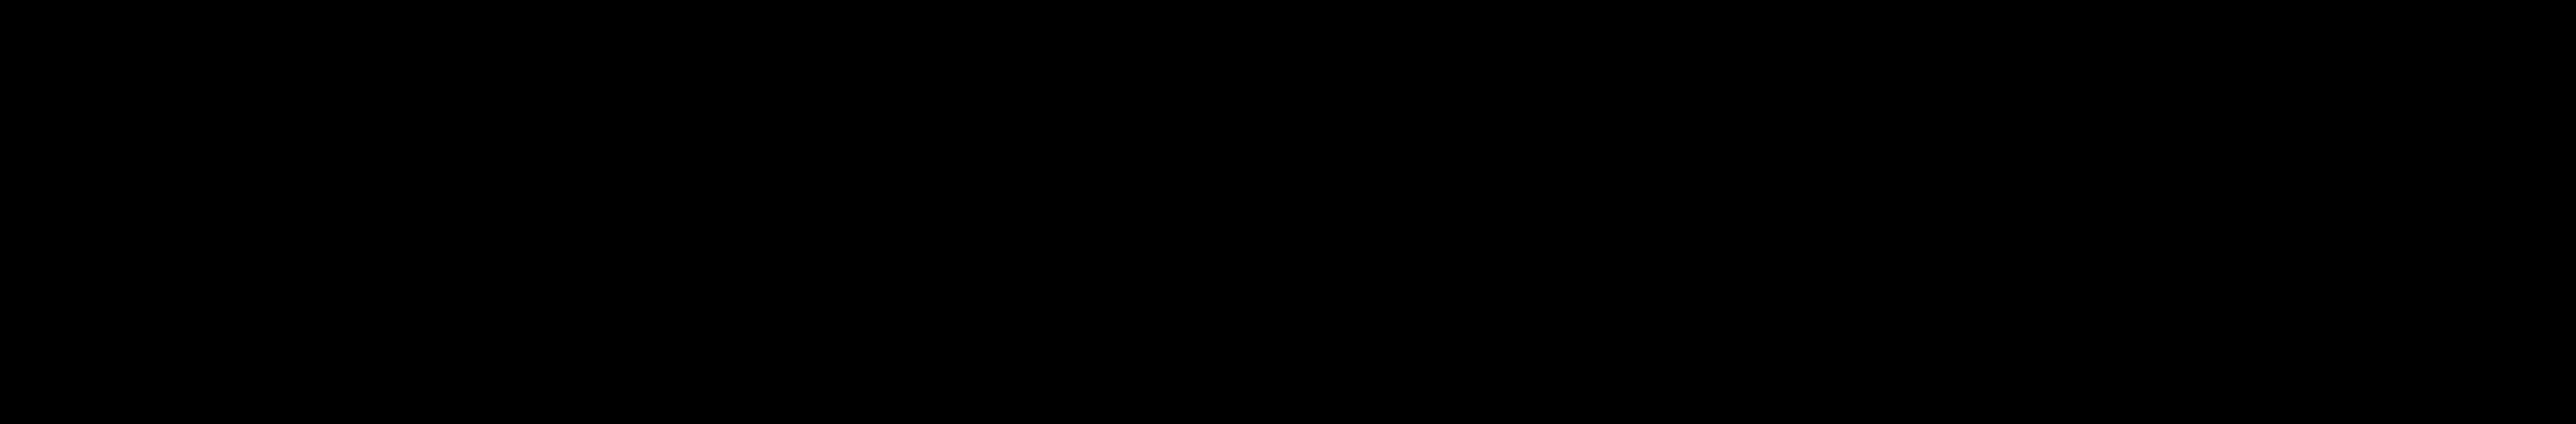 Solarcan